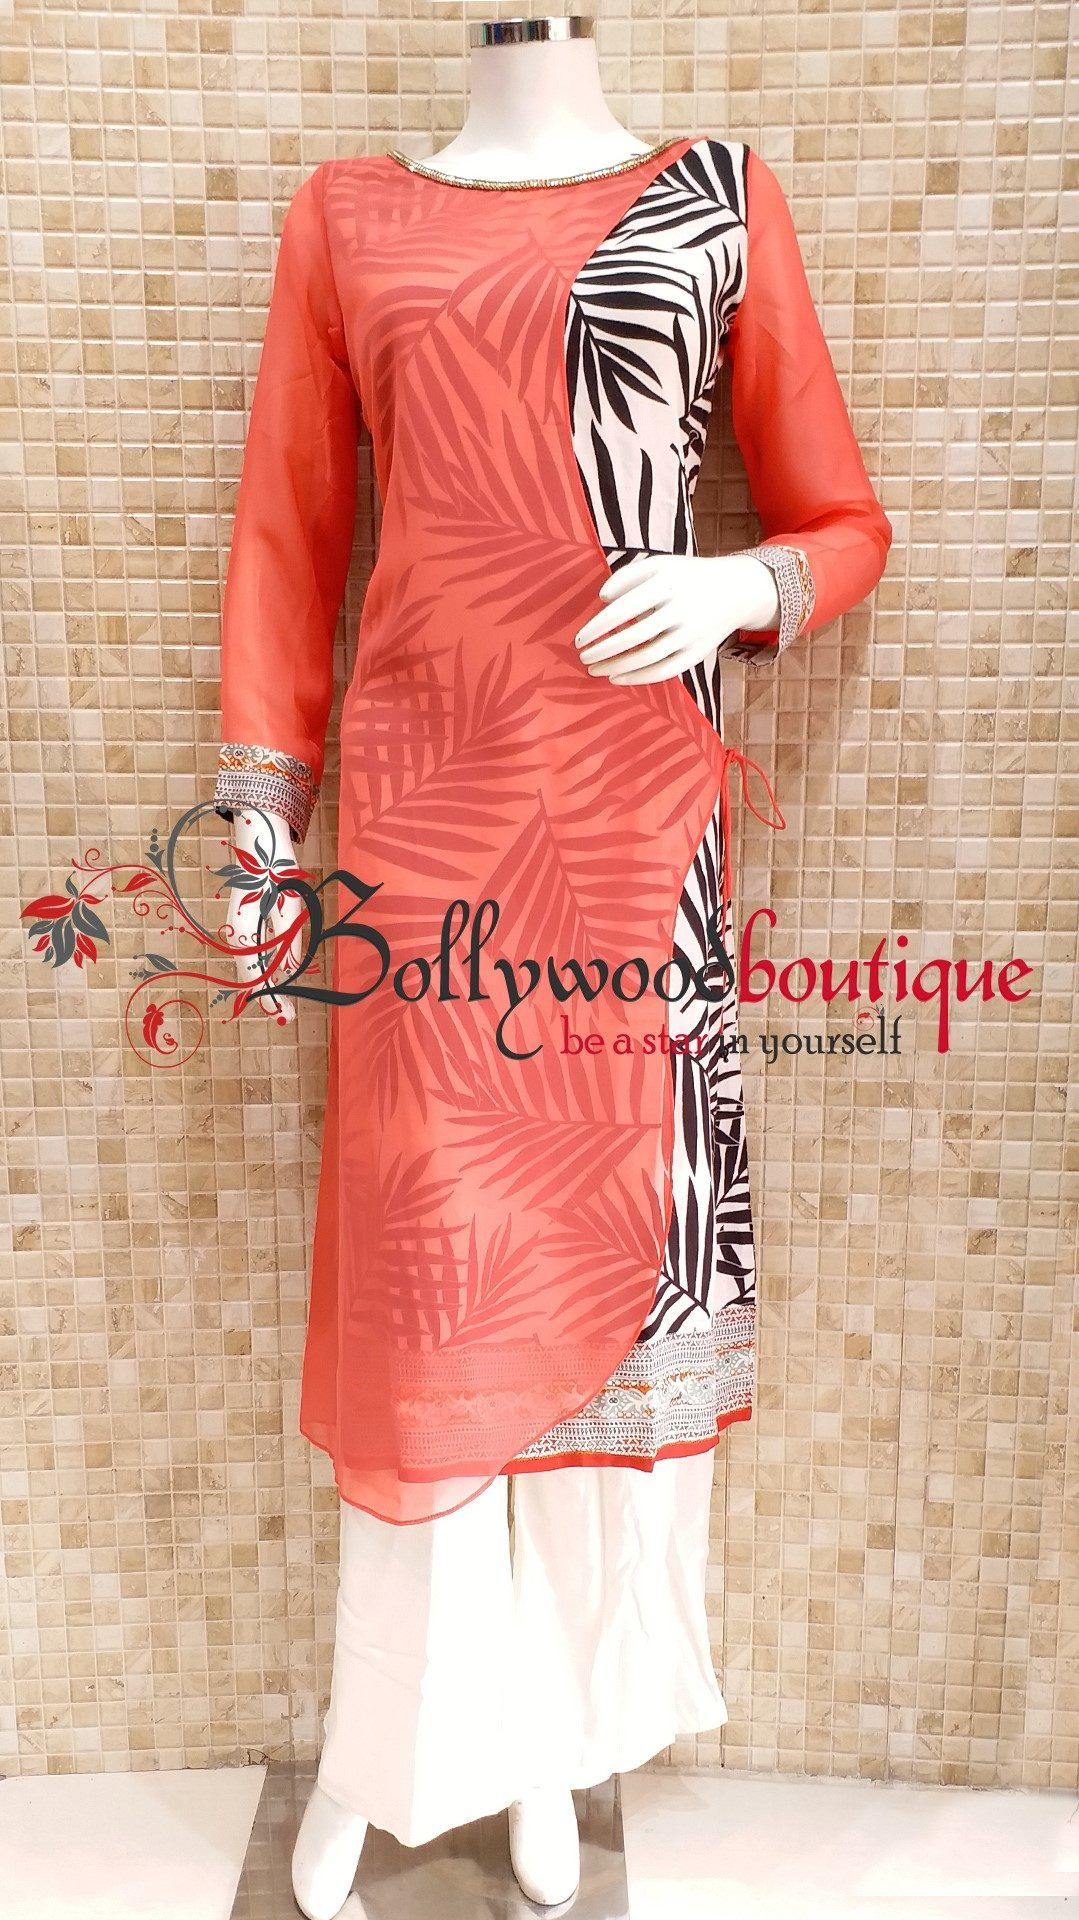 851a81c25b32 Designer Kurtis - Bollywood Boutique